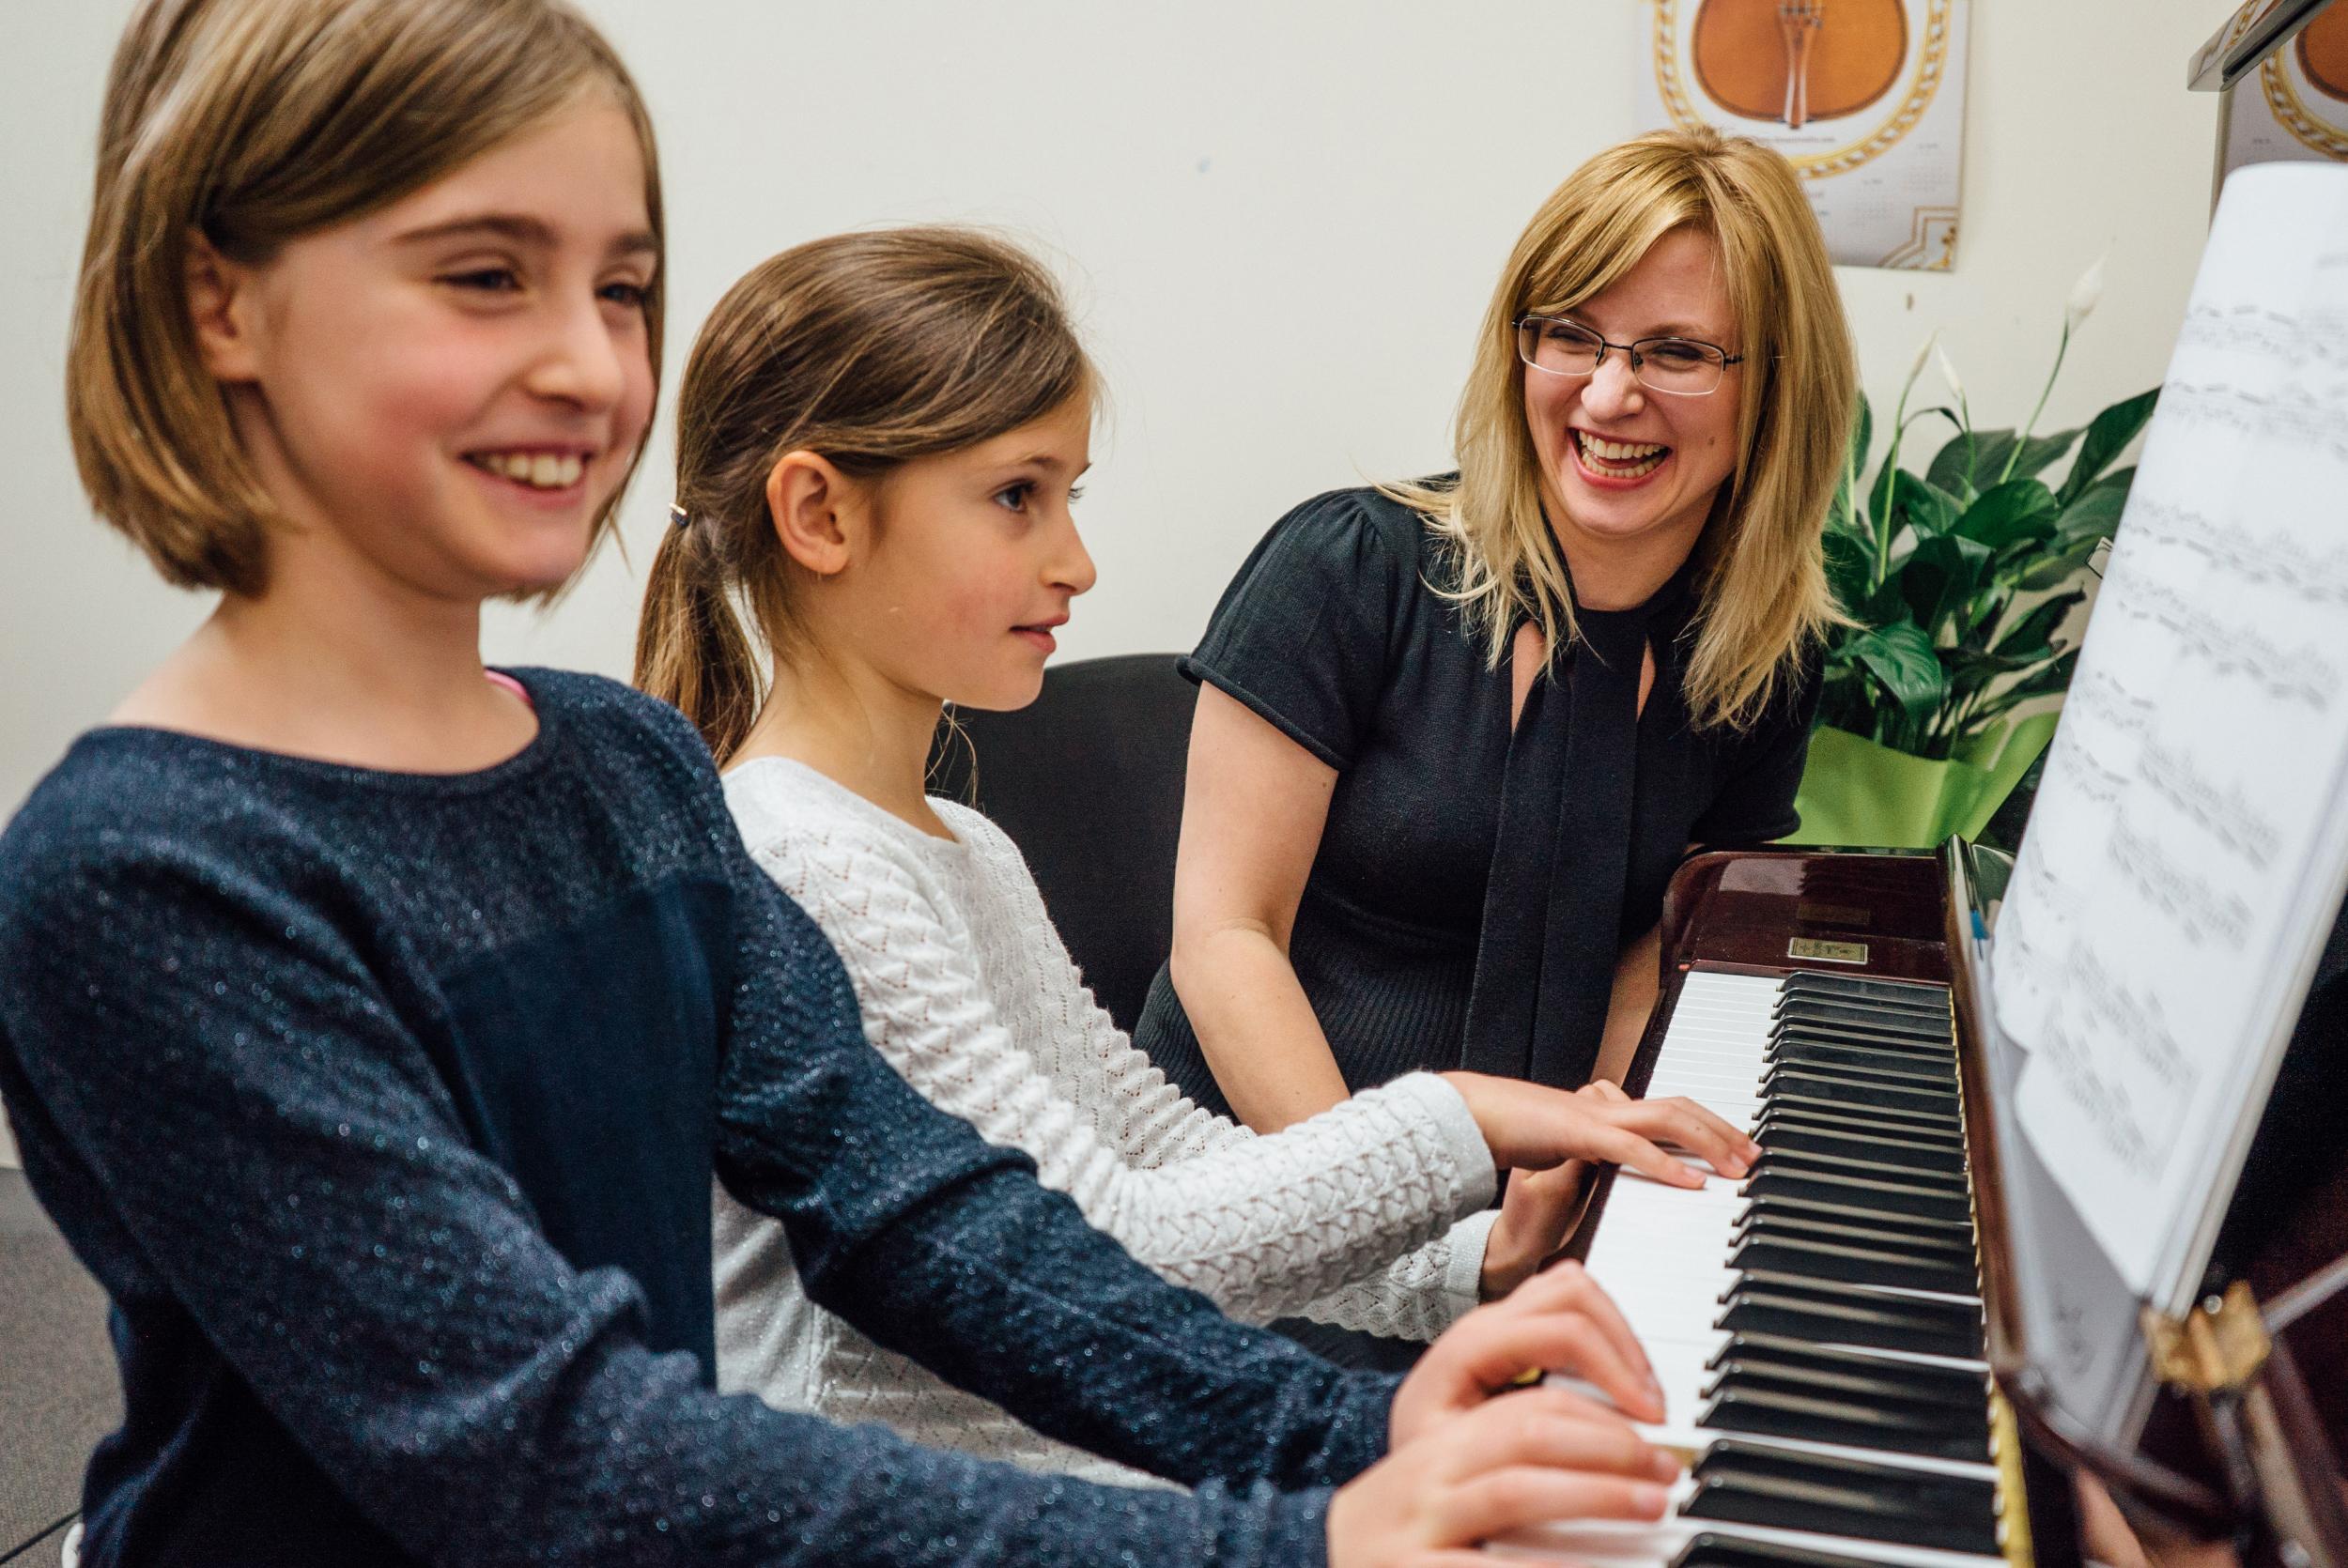 Girls having fun learning piano